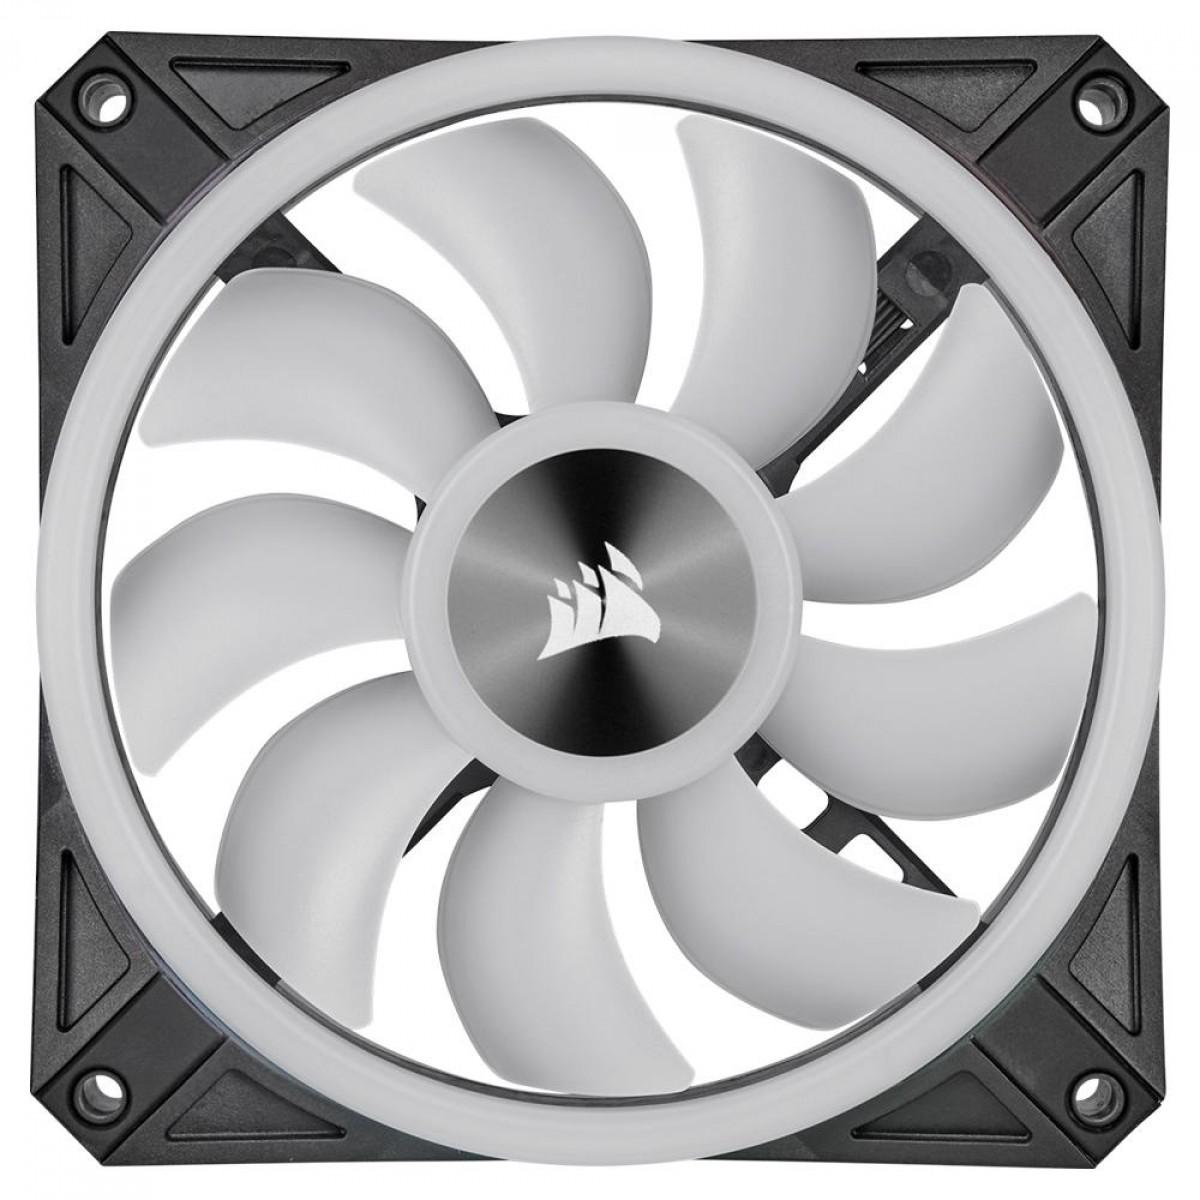 Cooler Para Gabinete Corsair RGB, 120mm RGB LED Fan, Single Pack CO-9050097-WW